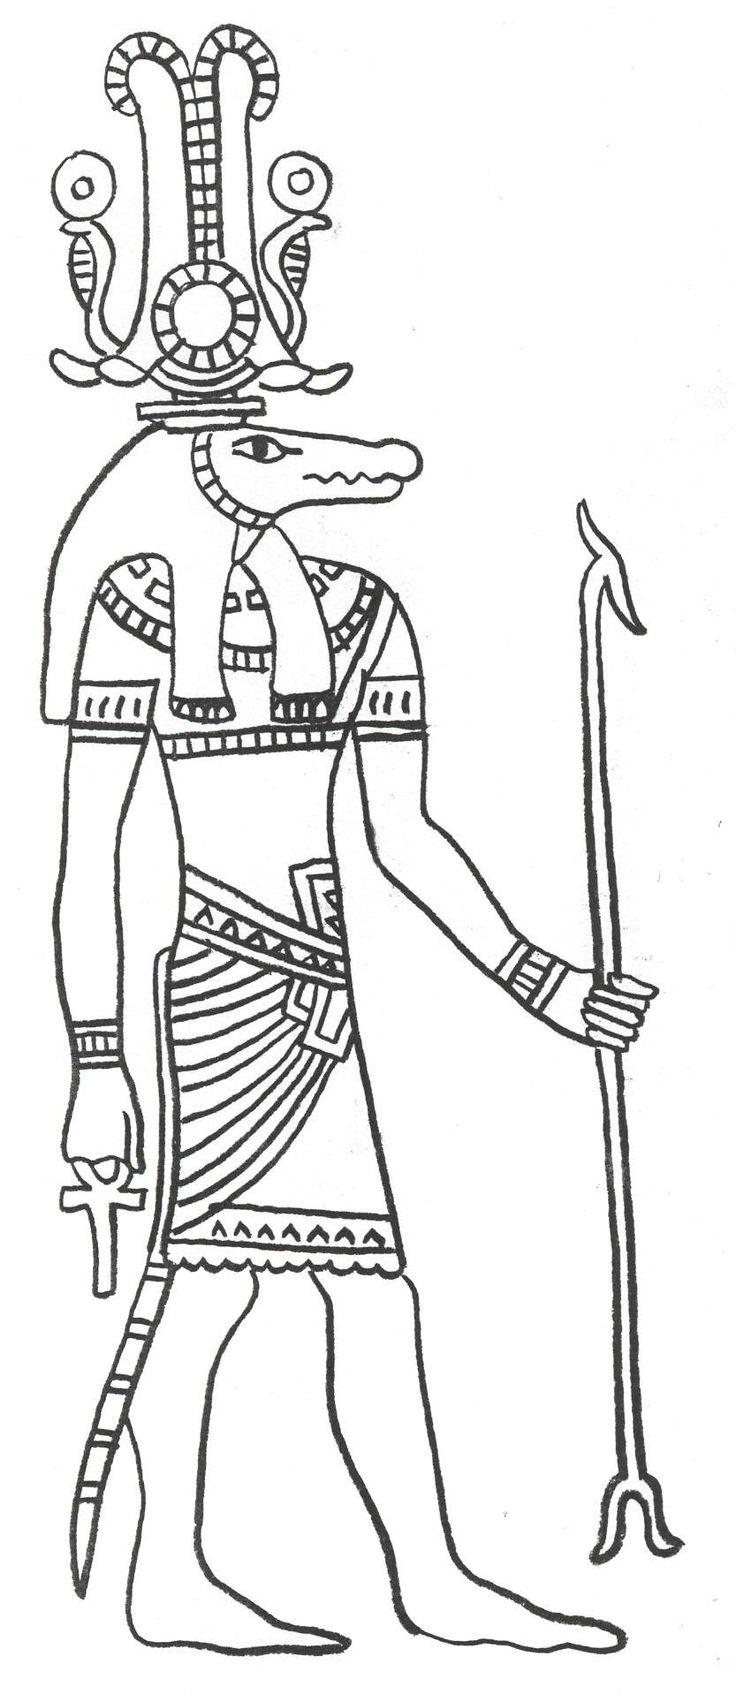 ACTIVITE - Coloriage des dieux égyptiens :       Amun-Ra      Anubis      Bastet      Bes      Hapy      Hathor      Horus      Imhotep      Isis      Nut      Osiris      Ra      Set      Sobek      Taweret      Thoth